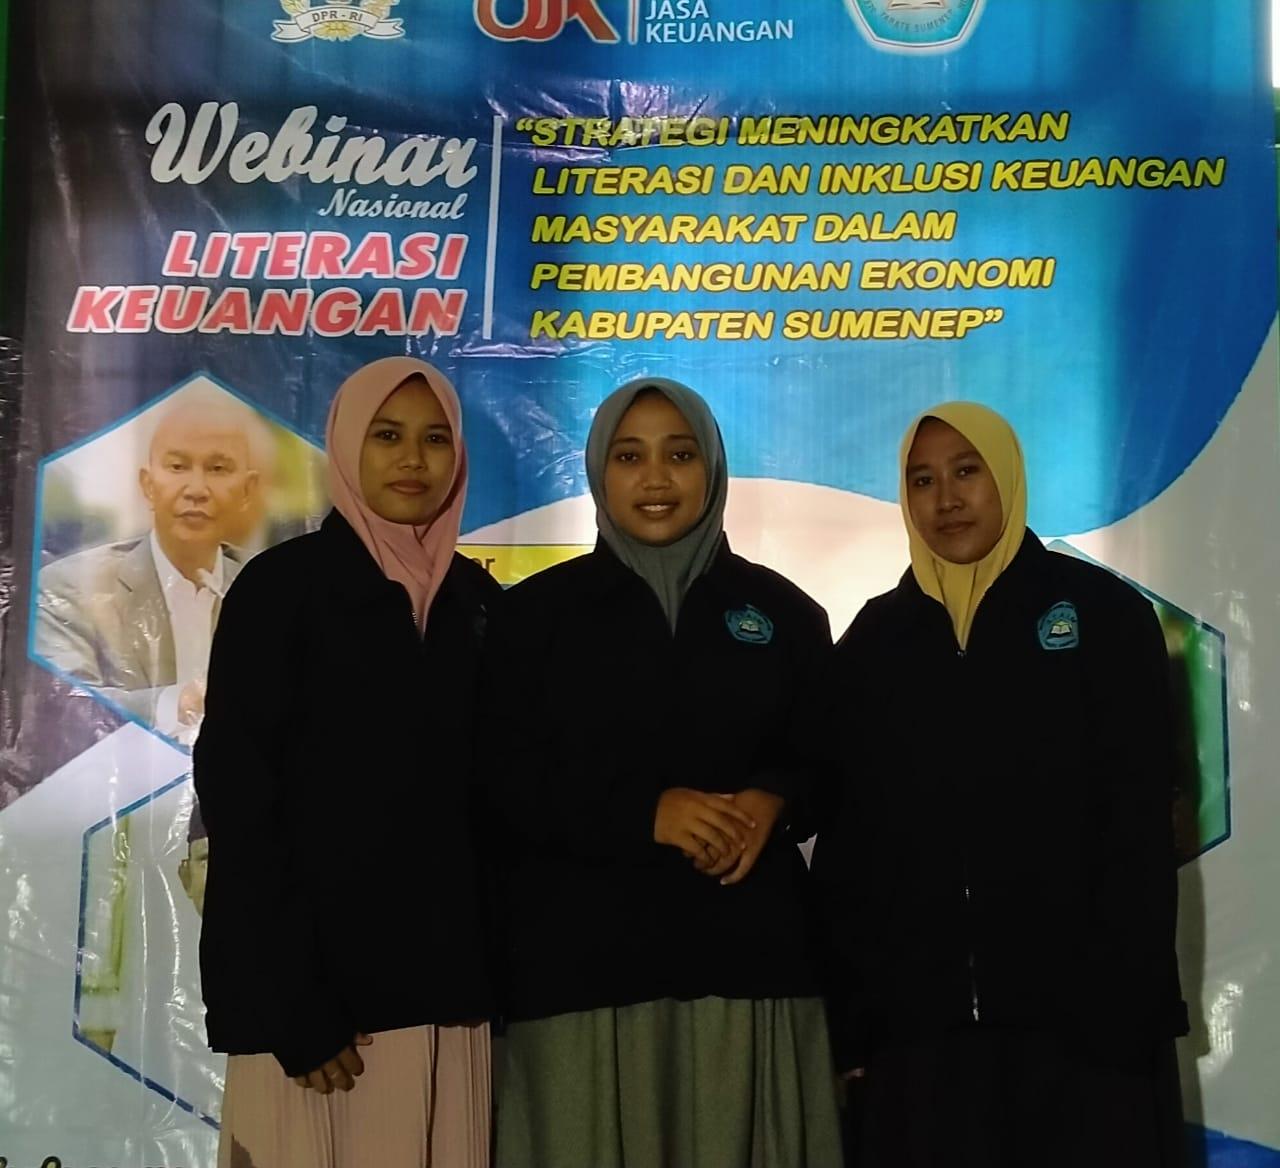 Webinar Nasional Literasi Keuangan Bekerjasama dengan Banggar DPR RI dan OJK Regional IV Jawa Timur